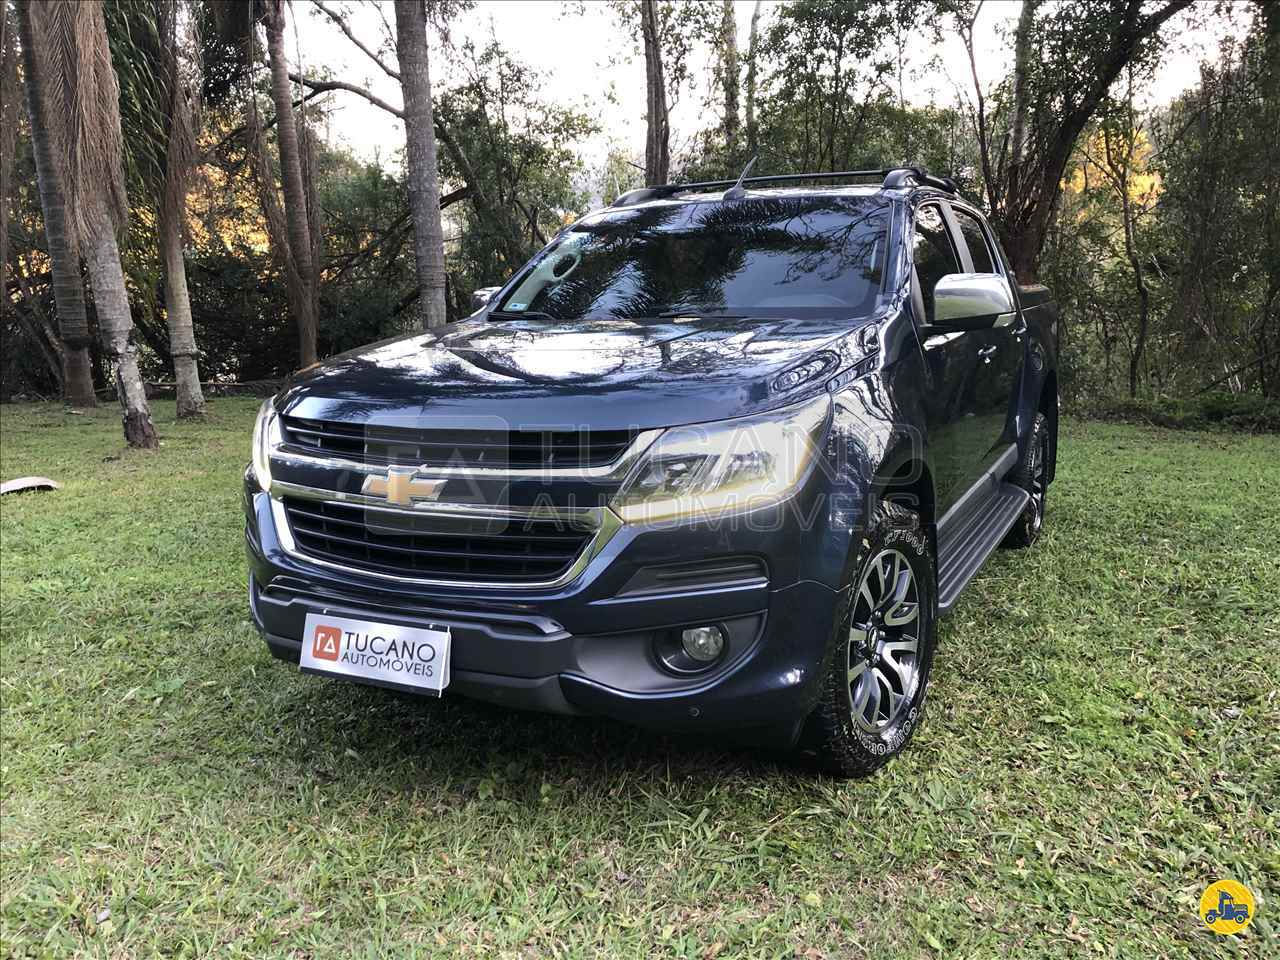 CARRO GM - Chevrolet S10 2.8 CD High Country Tucano Automóveis ALFREDO WAGNER SANTA CATARINA SC